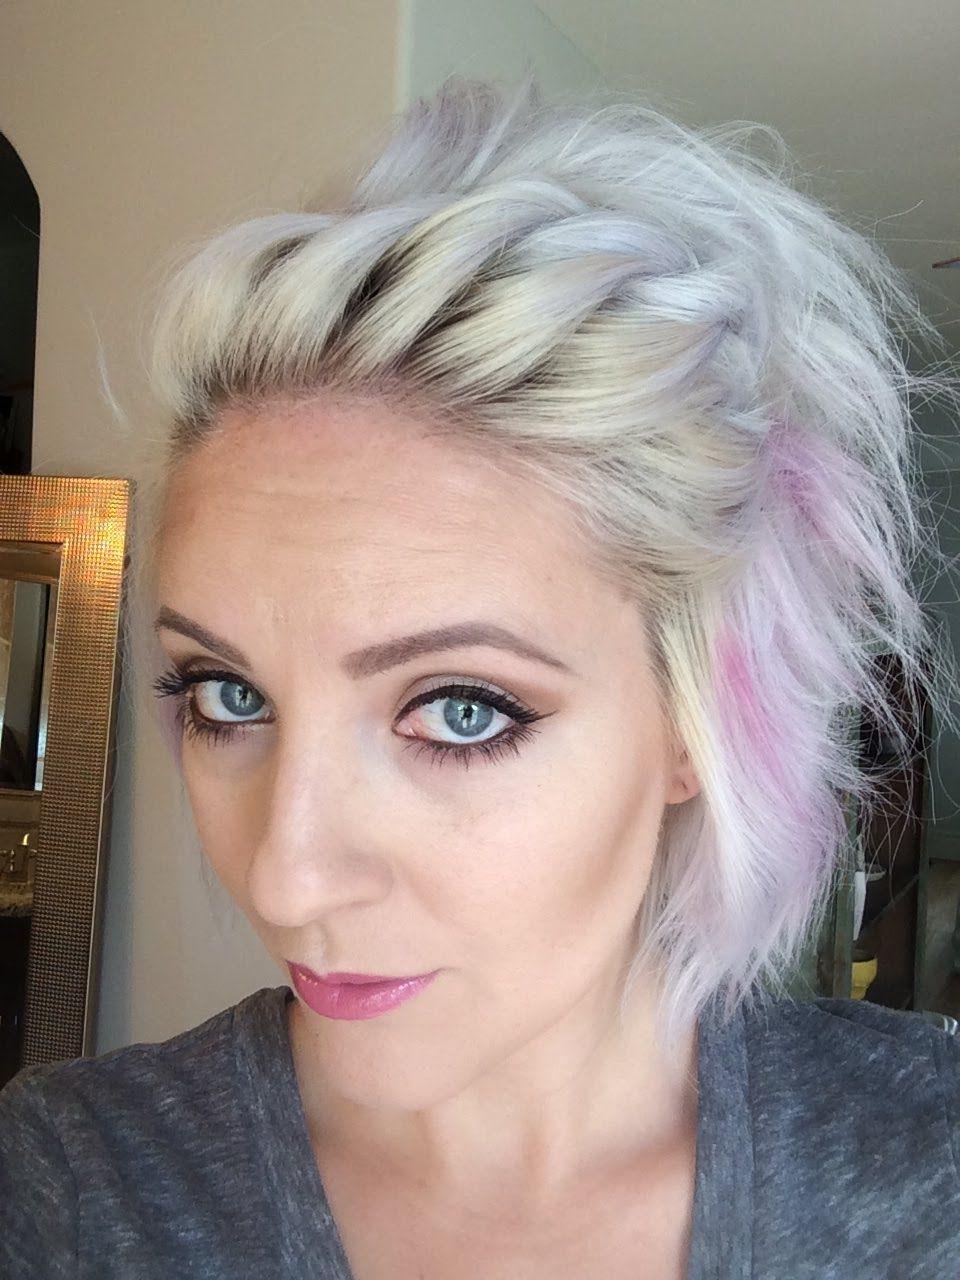 5 minute hairdo   Short hair tutorial, Short hair styles ...